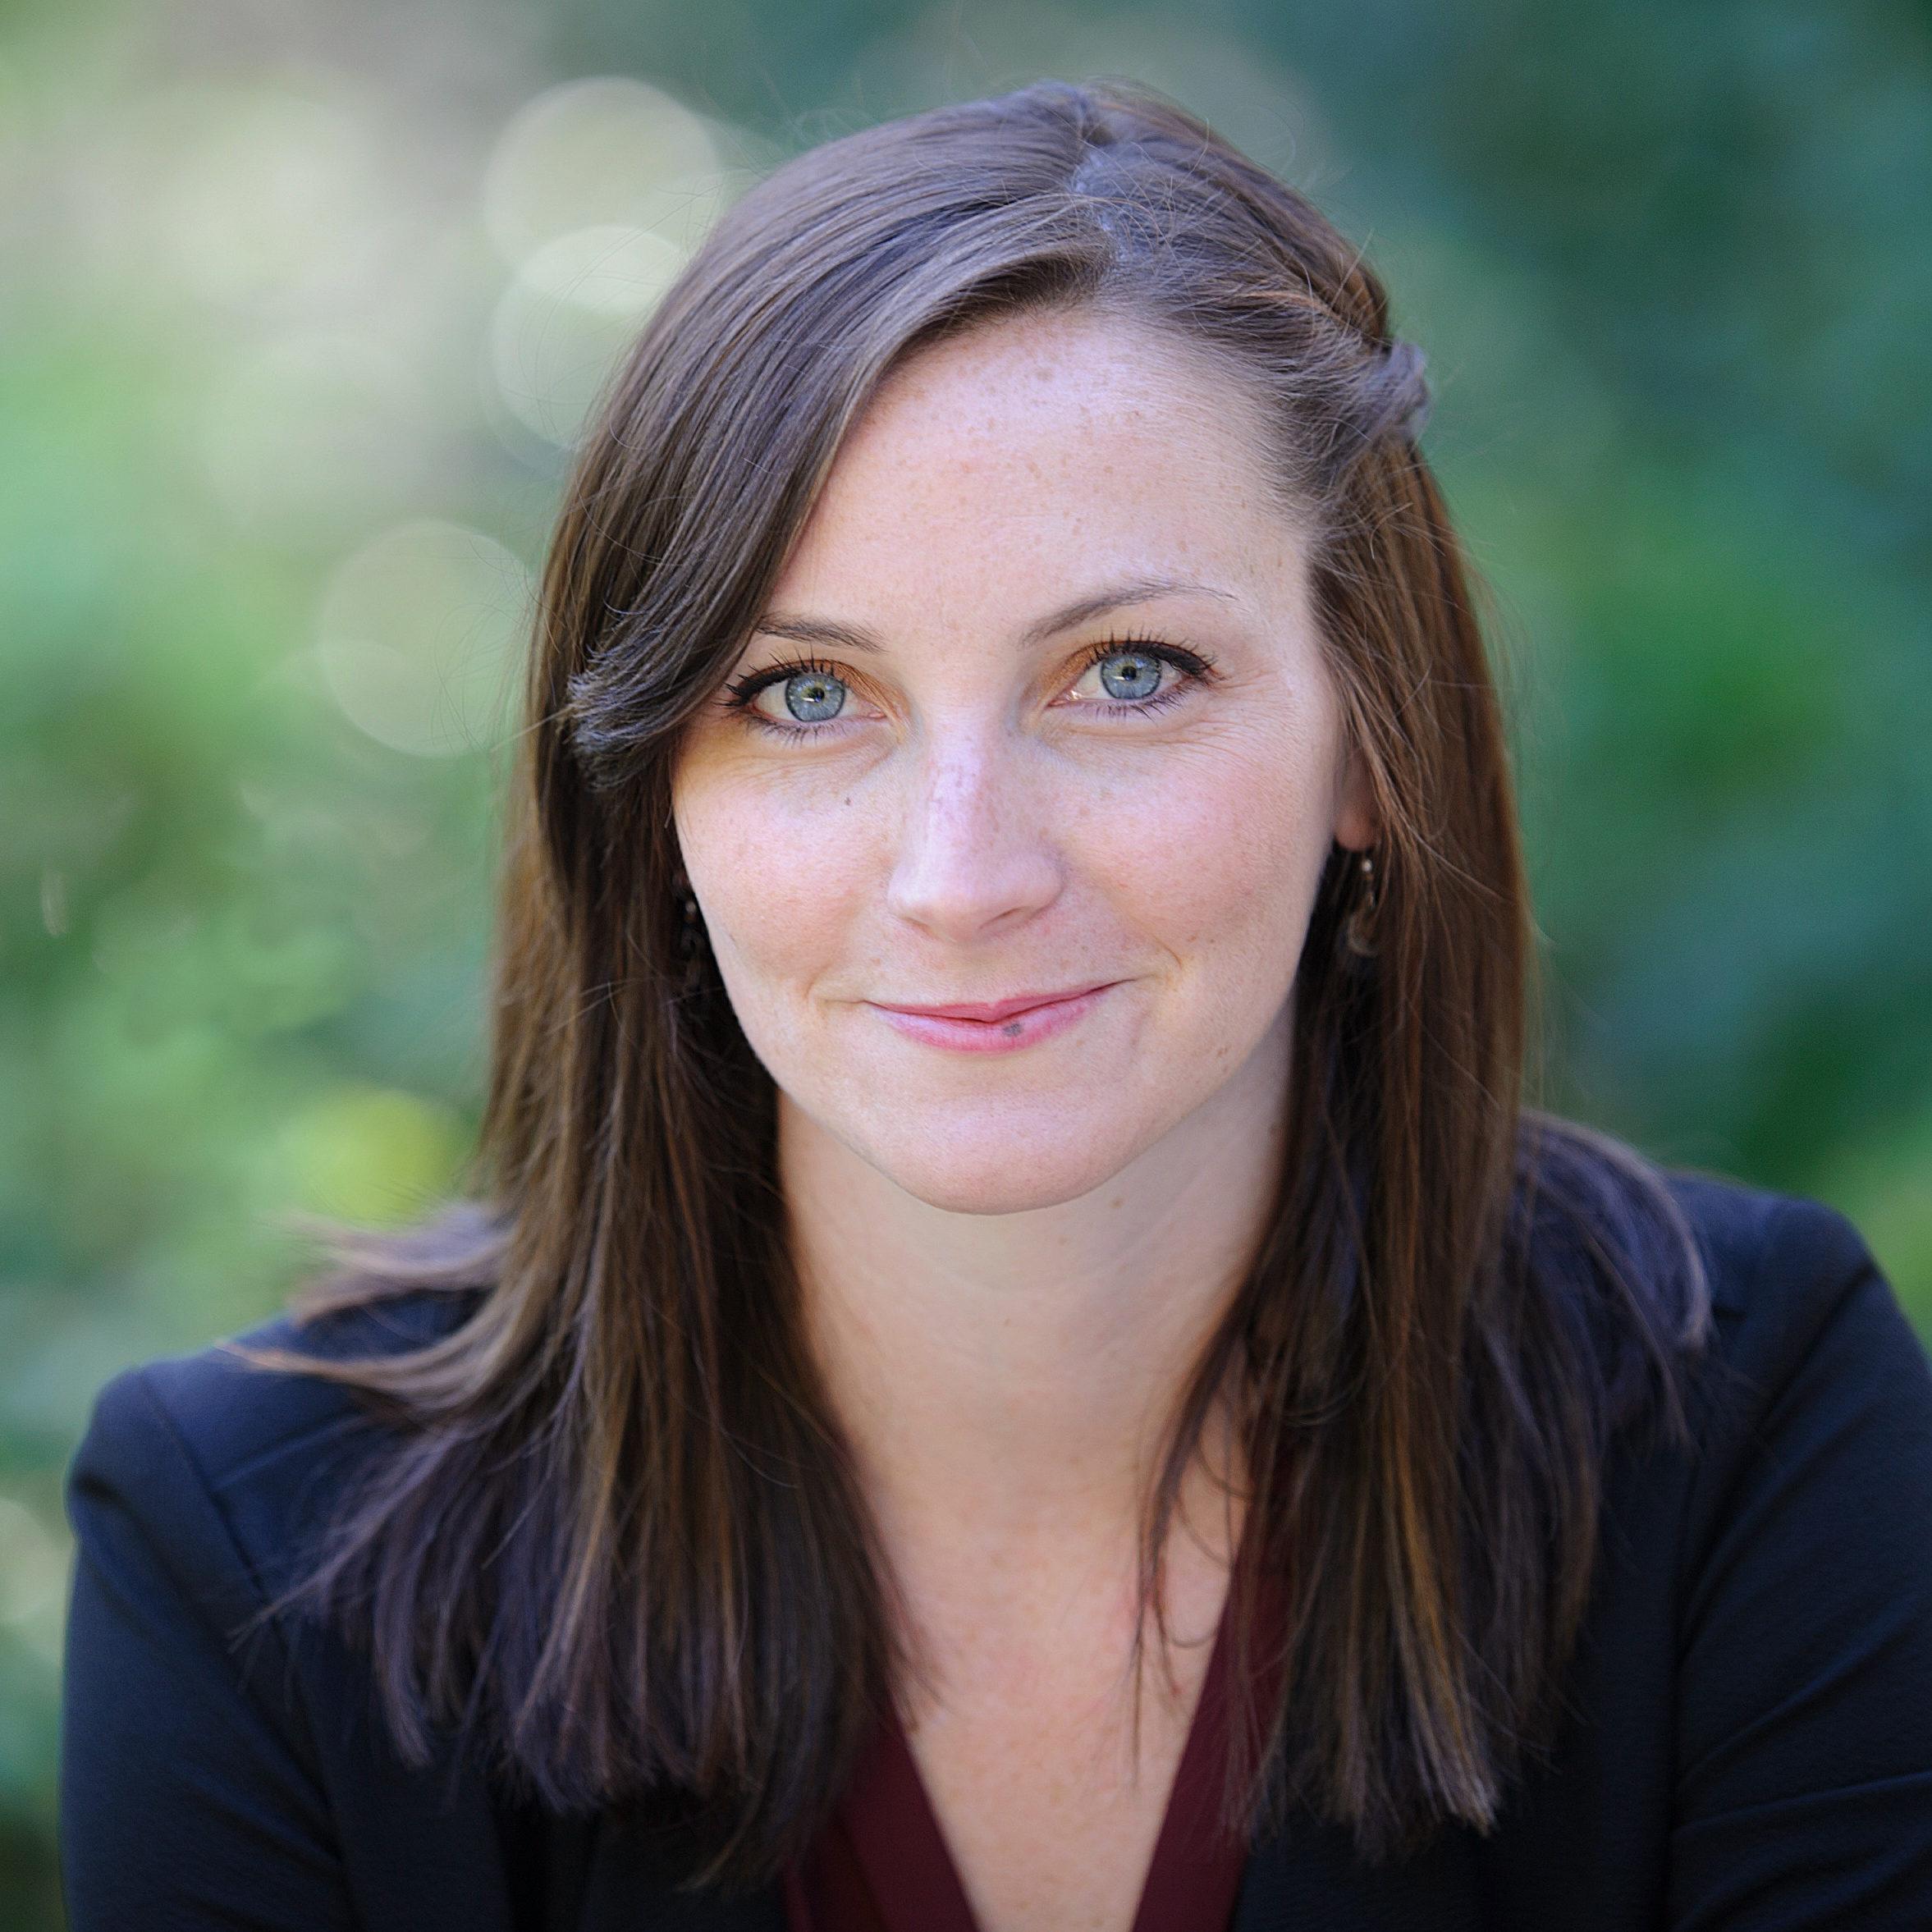 Natalie Daley